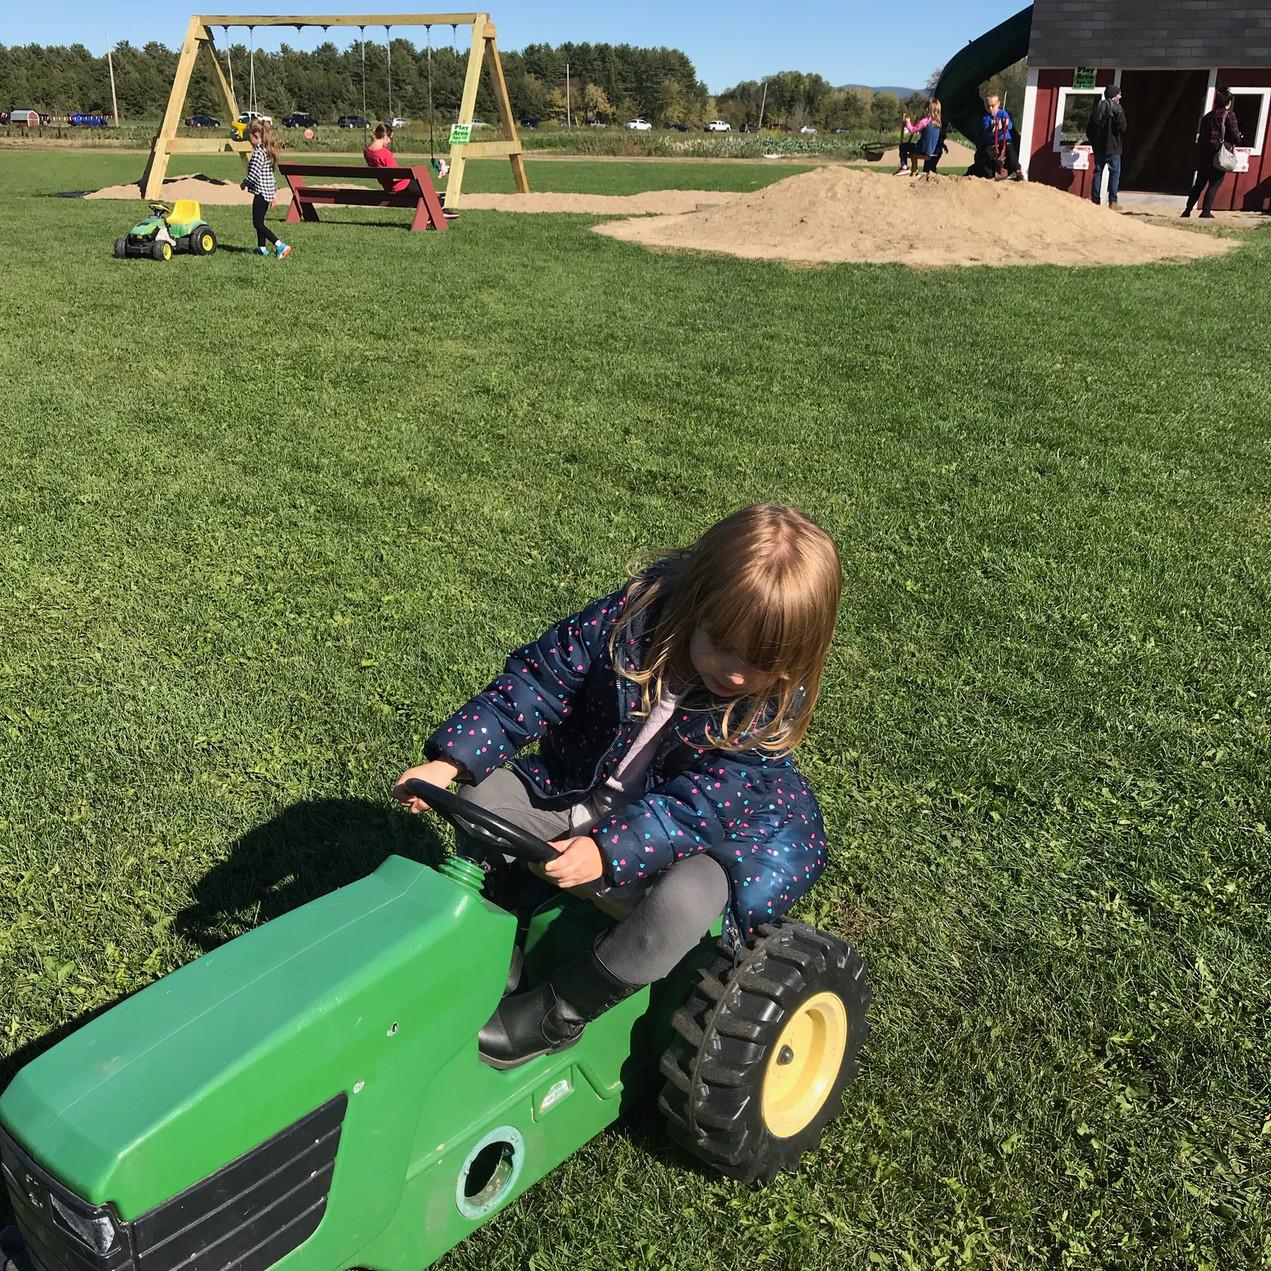 Sherman Farm Maze, North Conway, NH, New Hampshire, Fall Foliage, Corn Maze